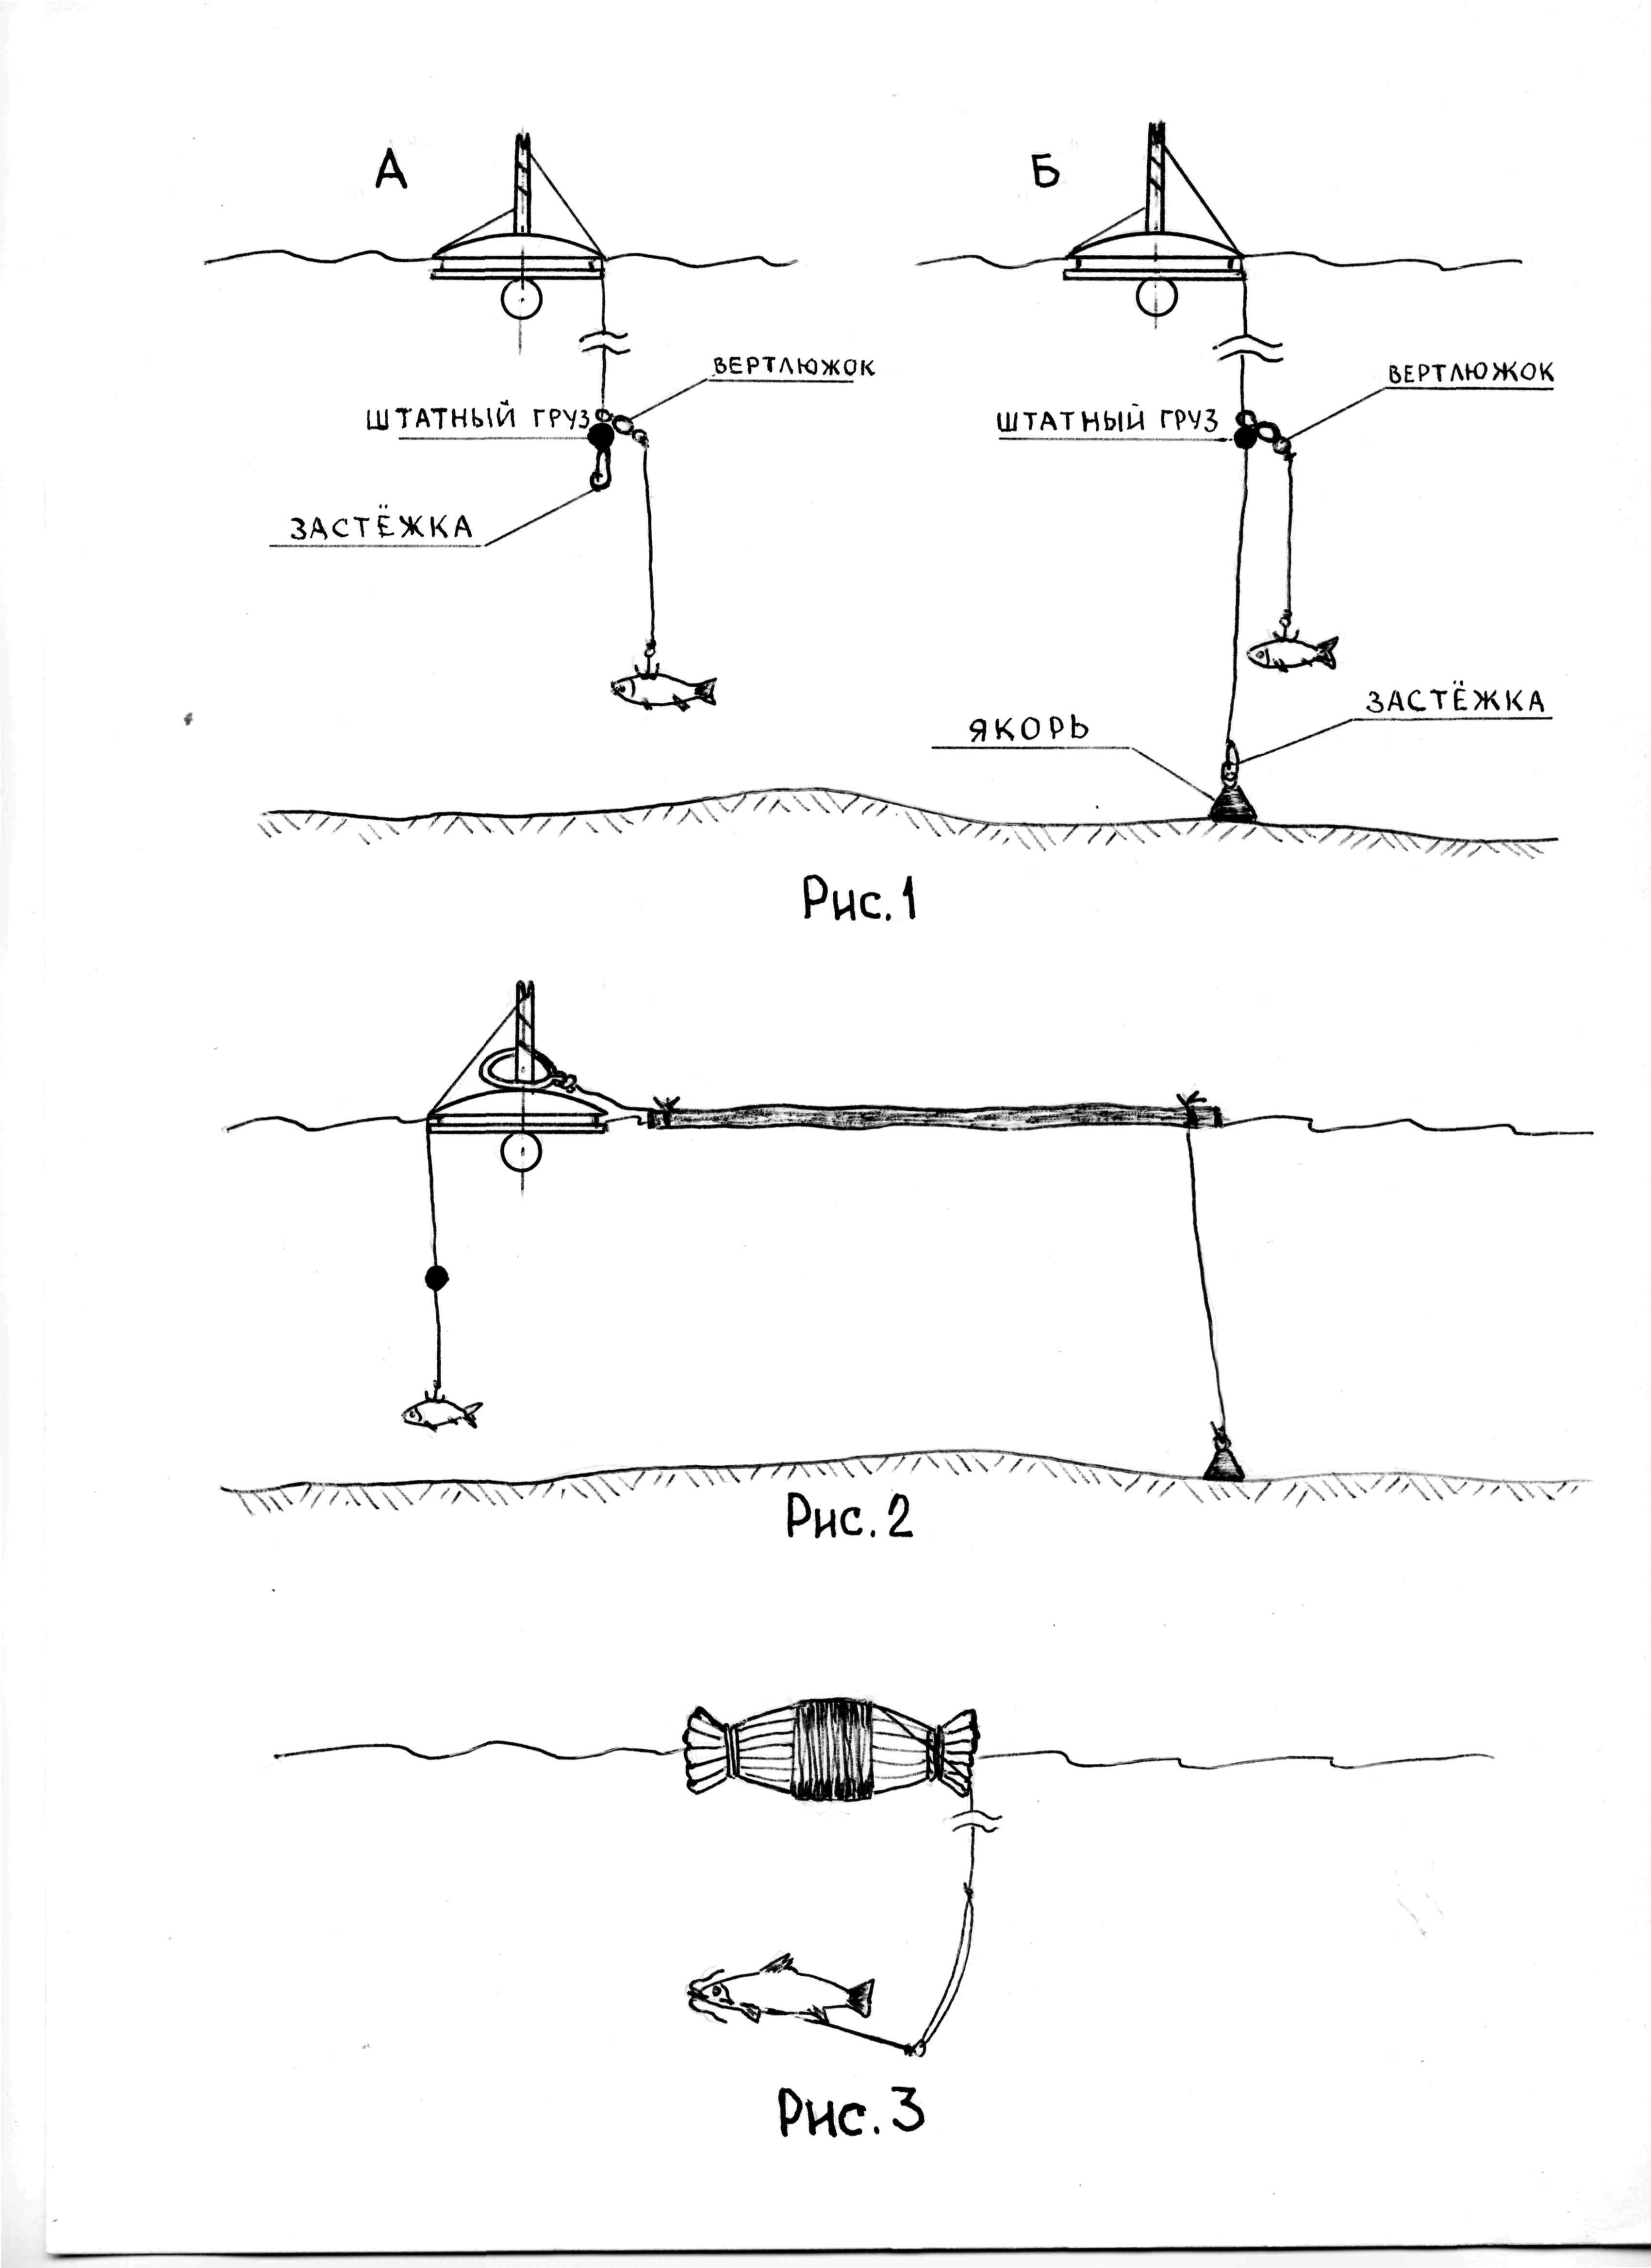 Анатолий Бовда о рыбалке и охоте